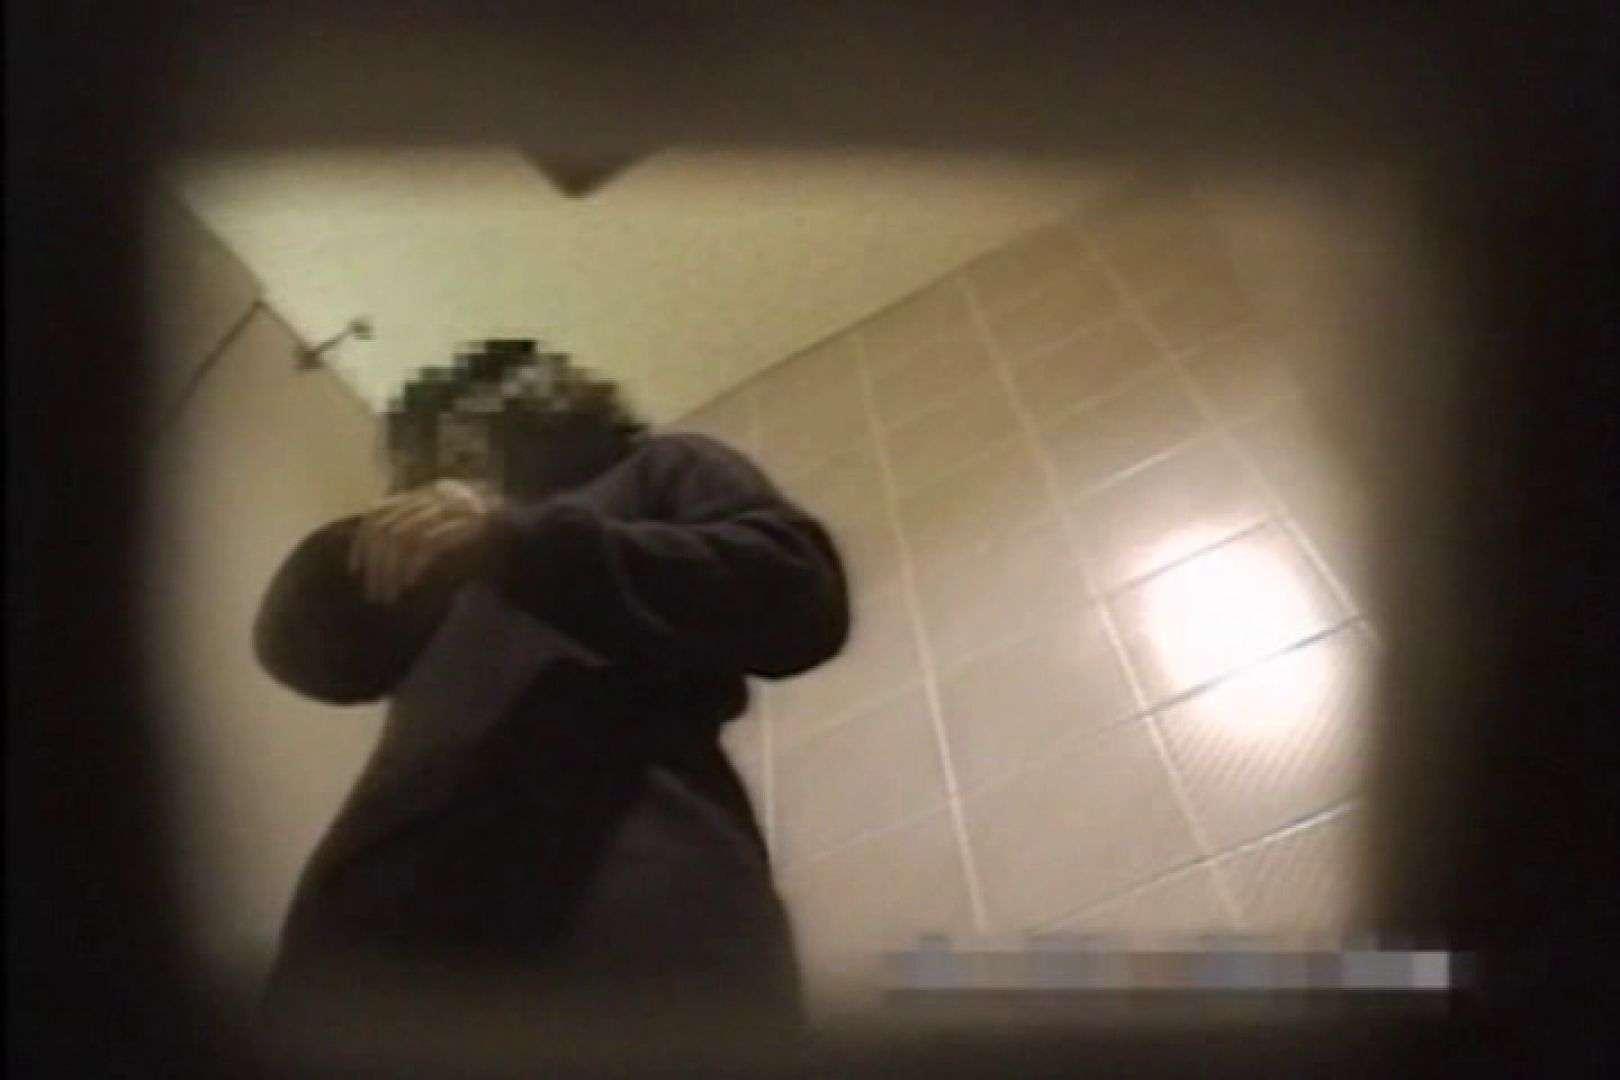 STY-013 実録!2カメde女子洗面所 洗面所 盗み撮り動画 113pic 12